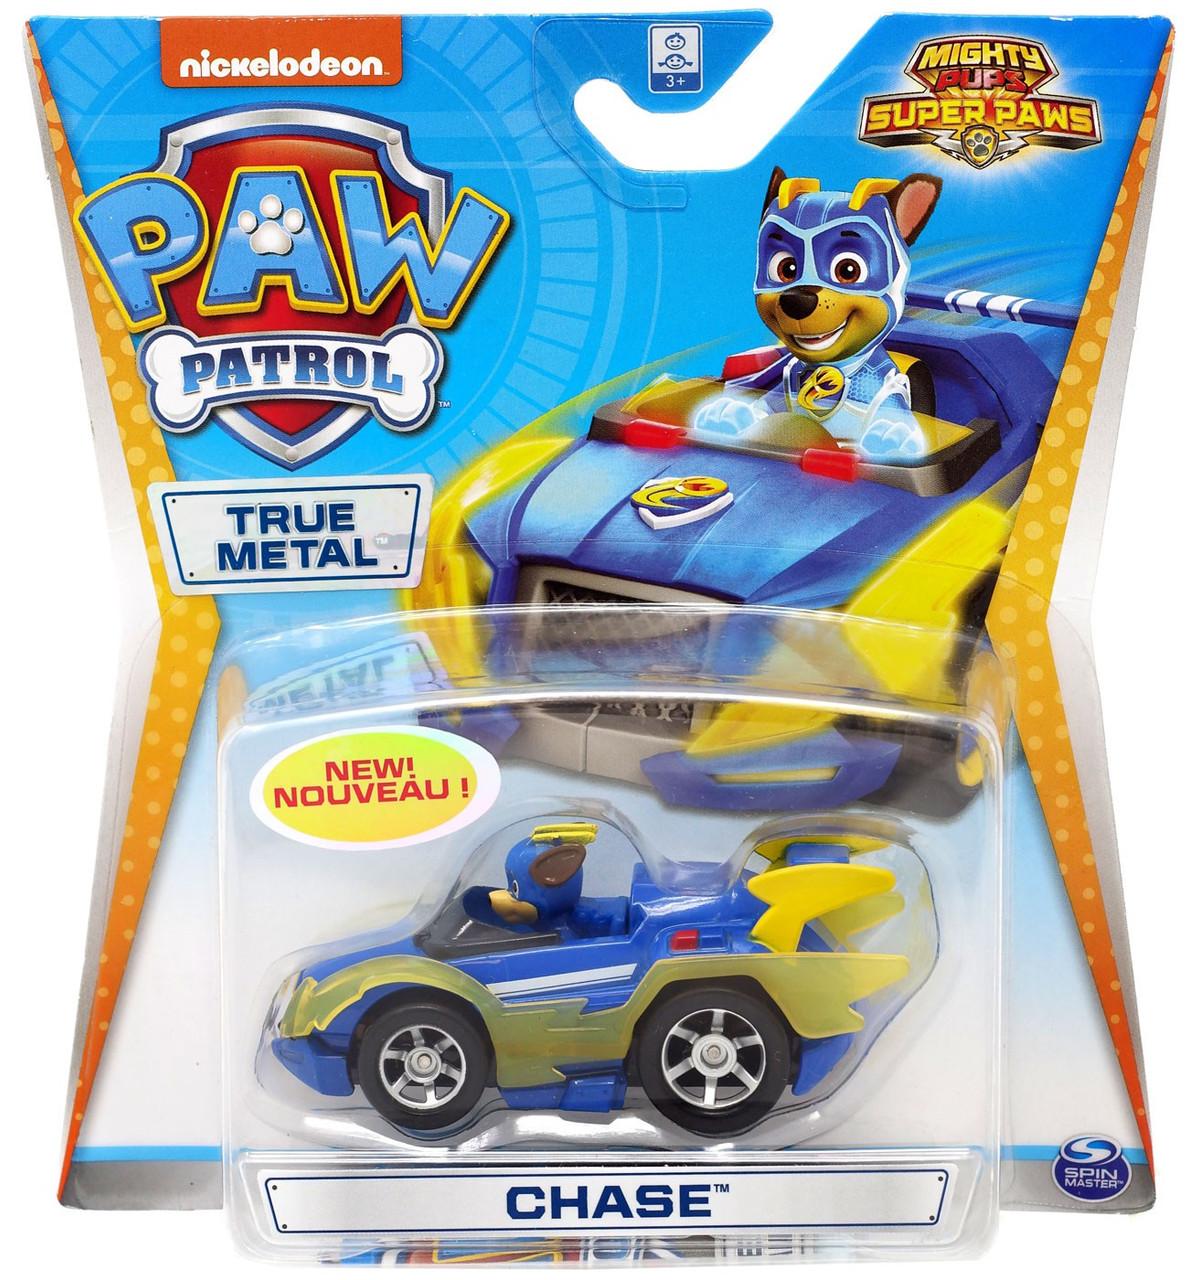 Paw Patrol Mighty Pups Super Paws True Metal Chase Diecast Car [Mighty Pups  Super Paws]